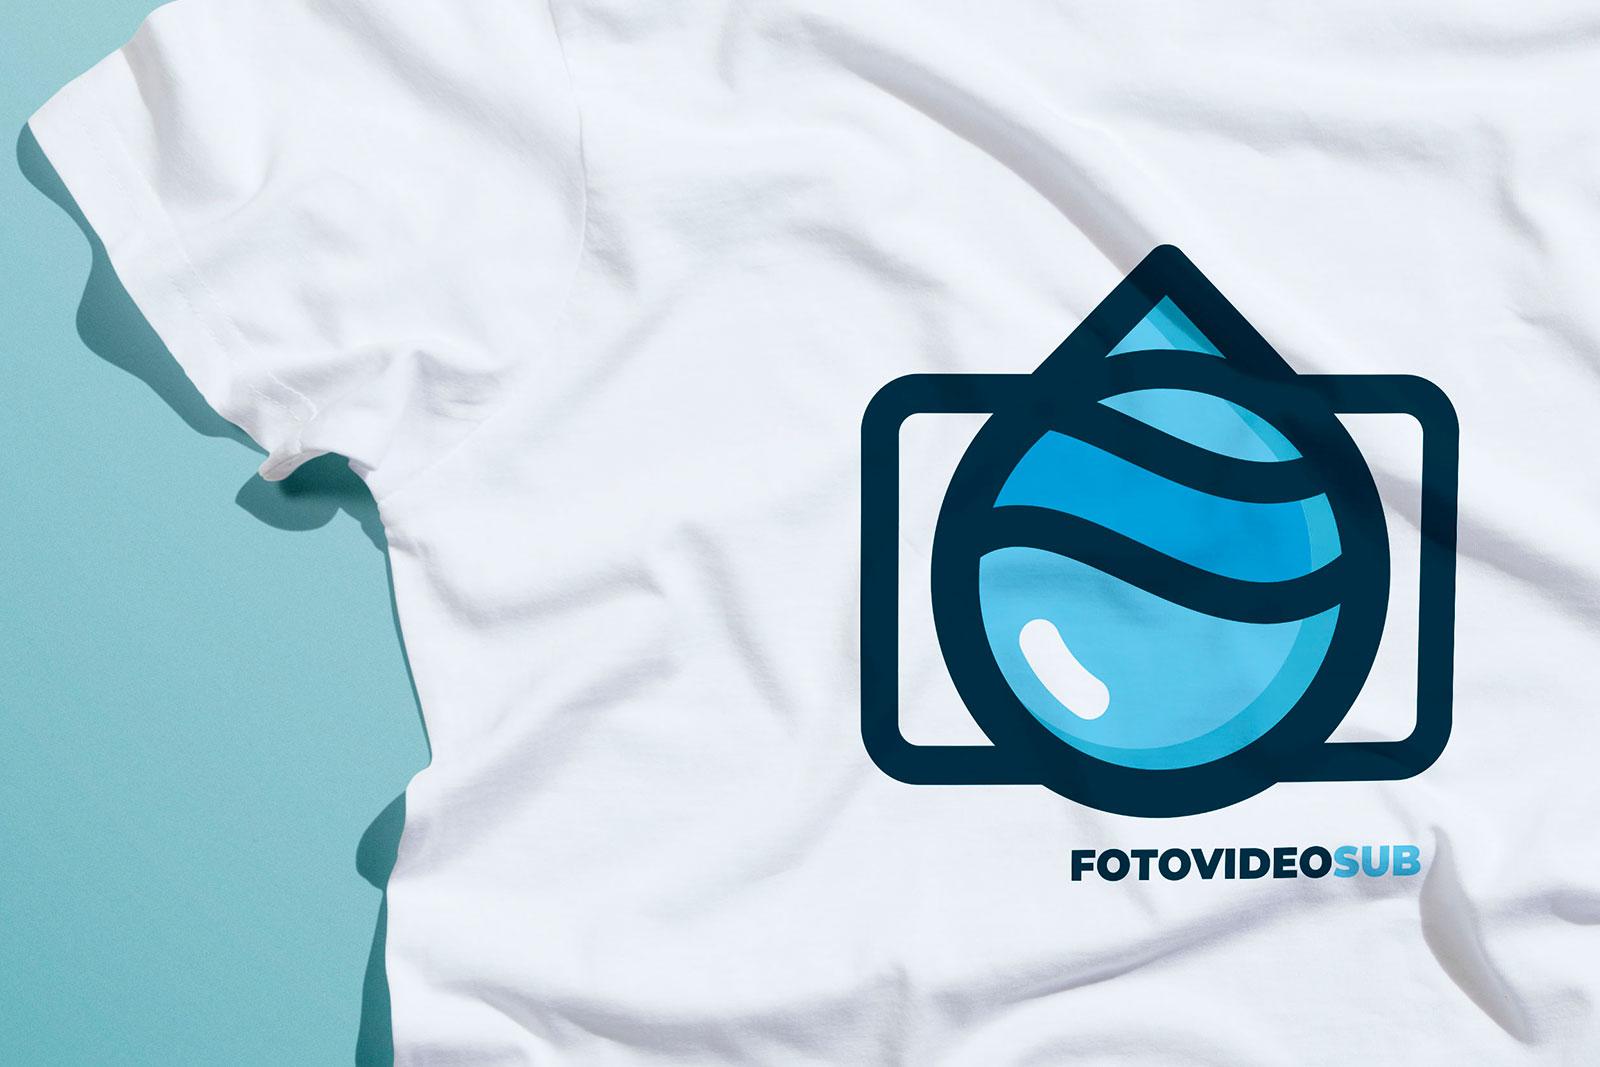 Consigue la camiseta FotoVideoSub 2019